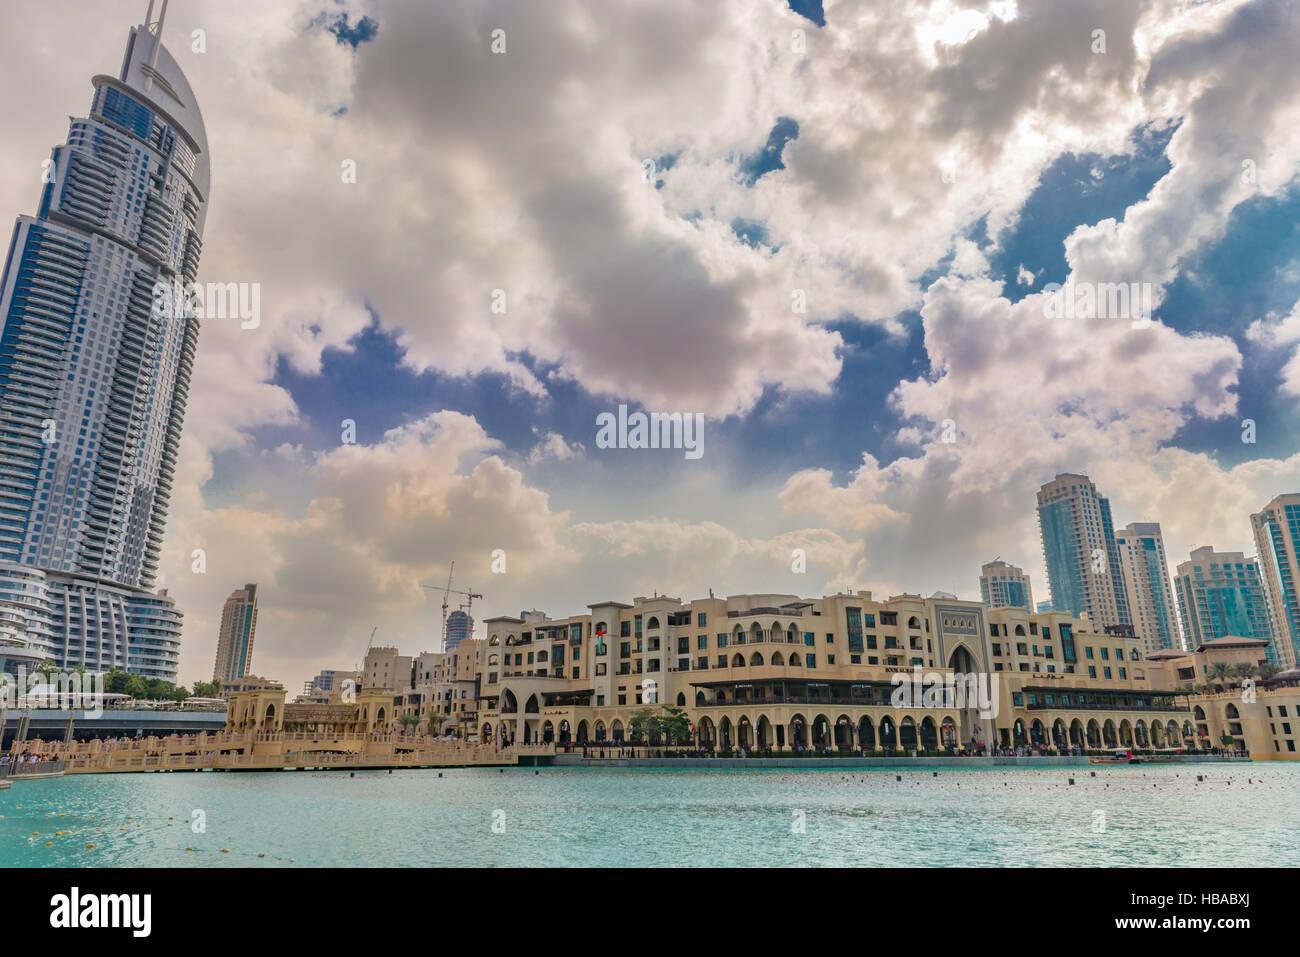 Souk Al Bahar and The Address Hotel, Dubai - Stock Image